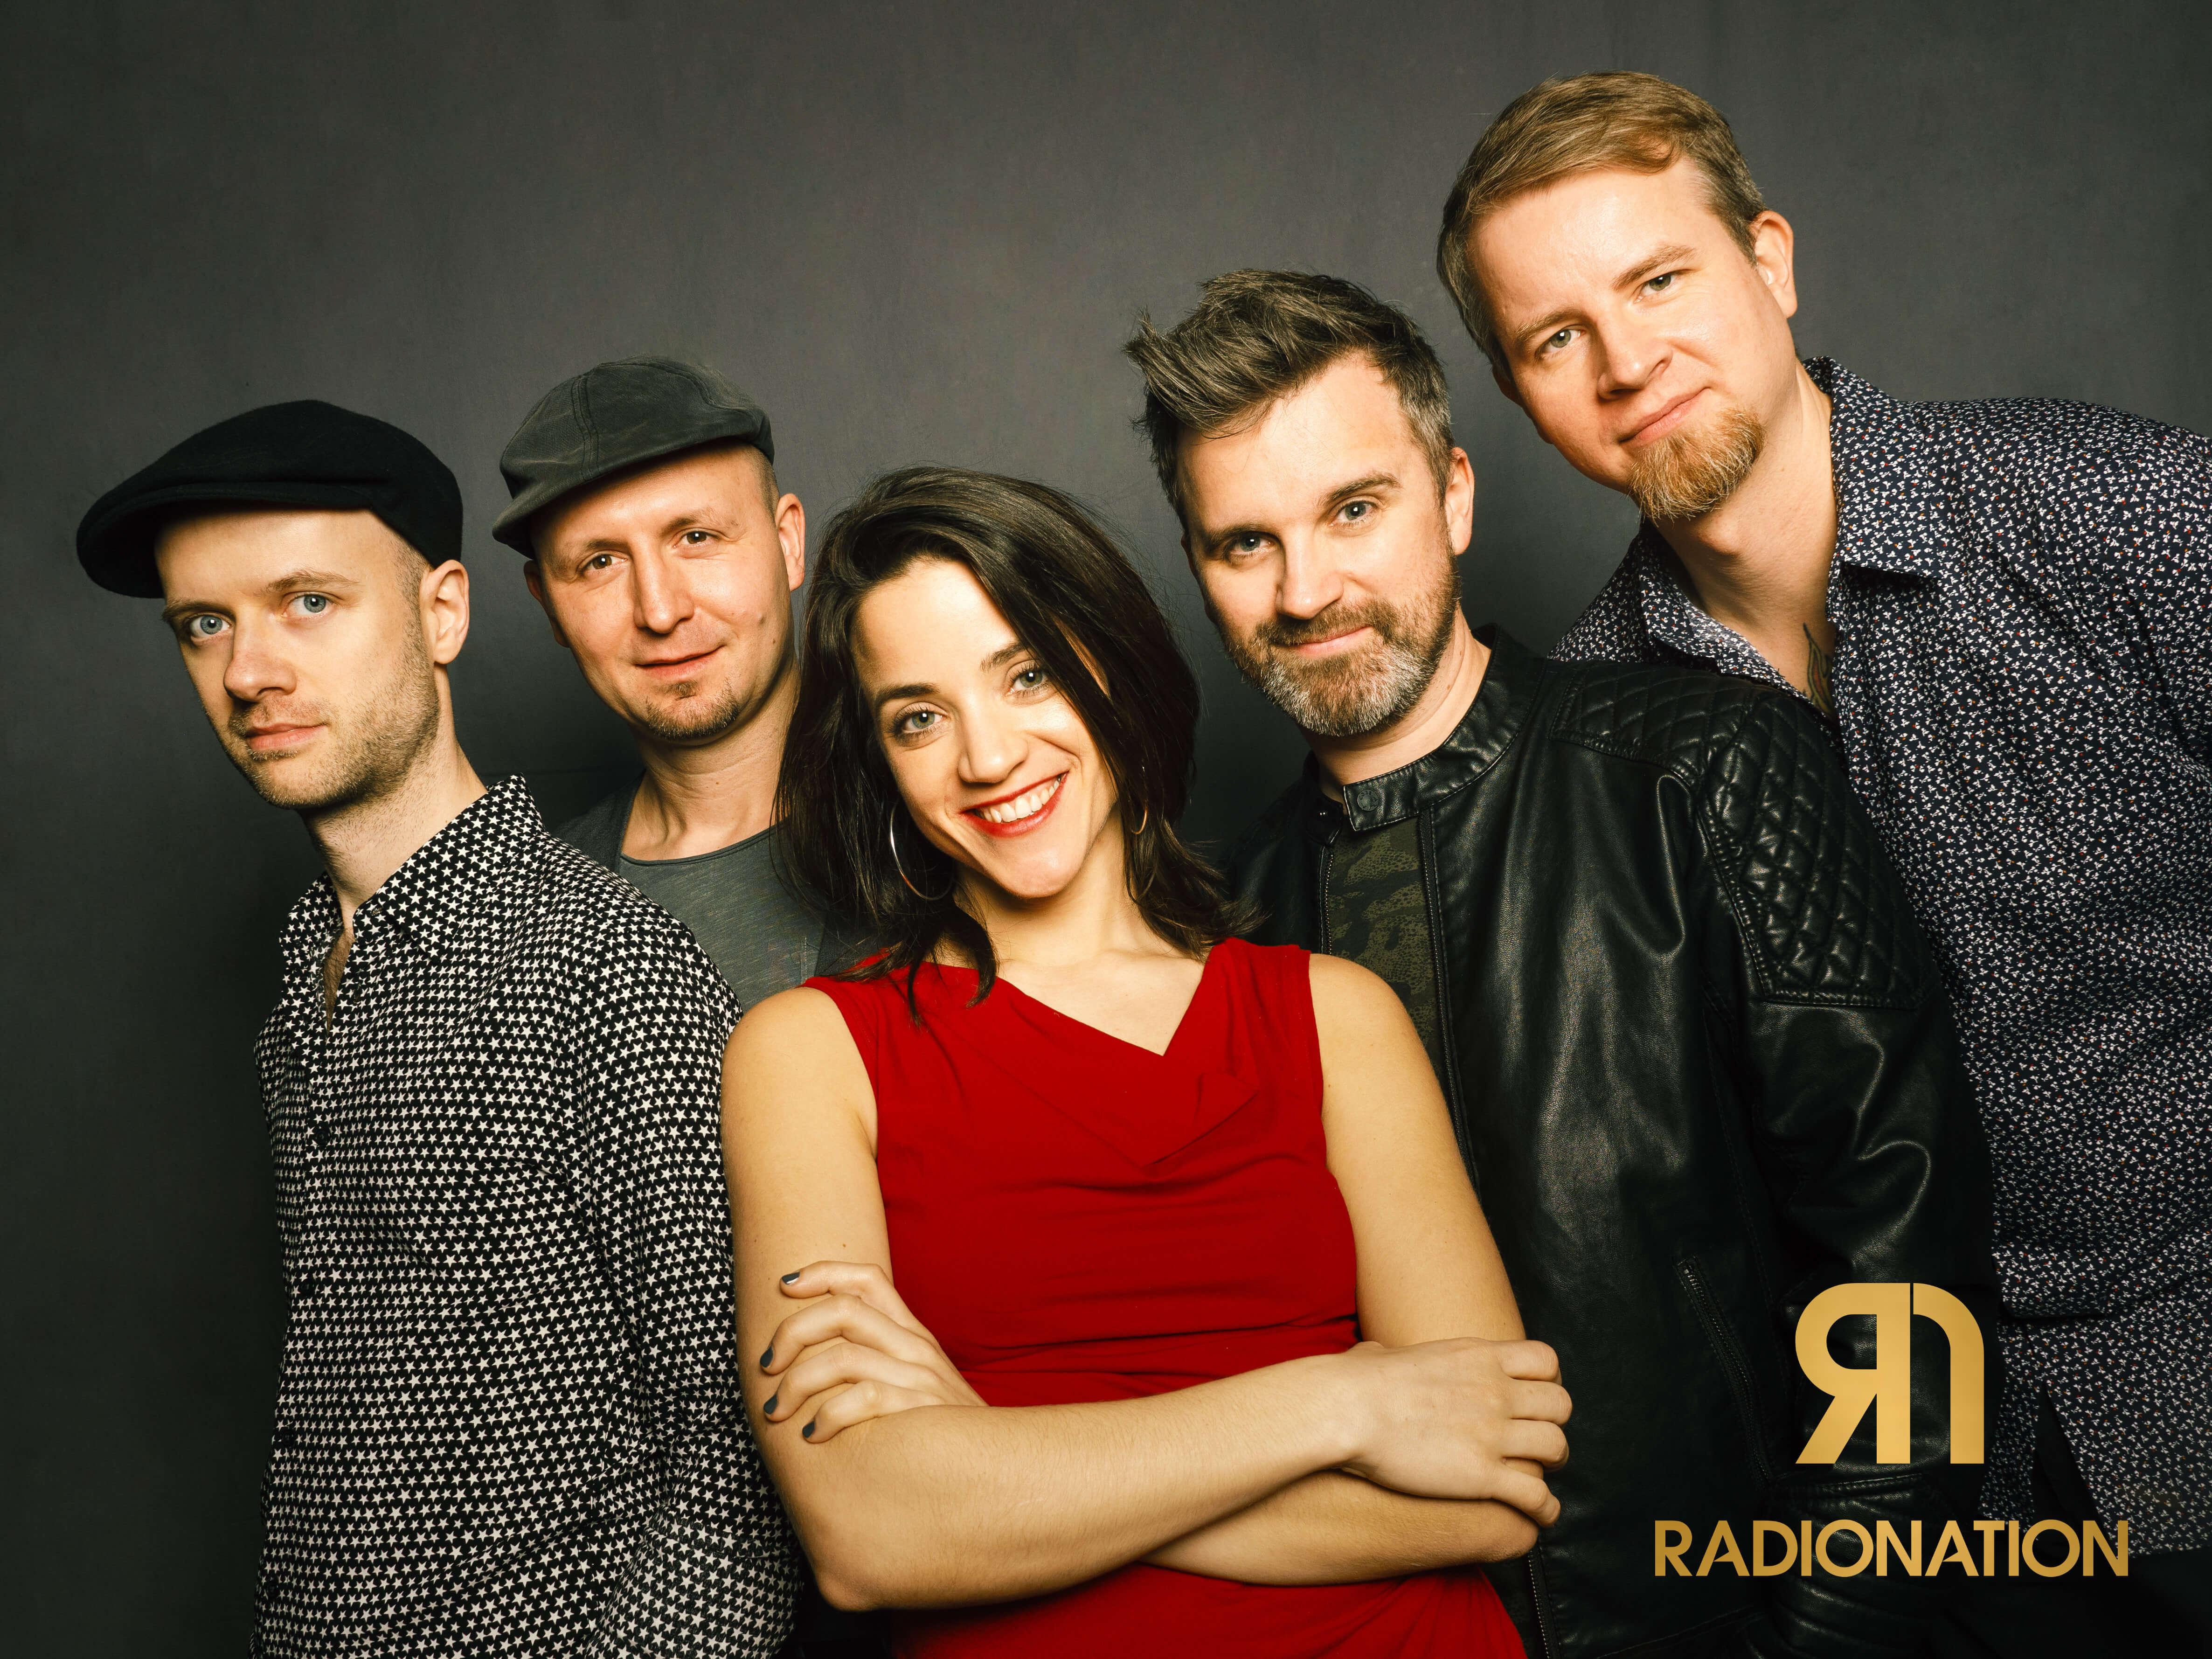 Band – RadioNation